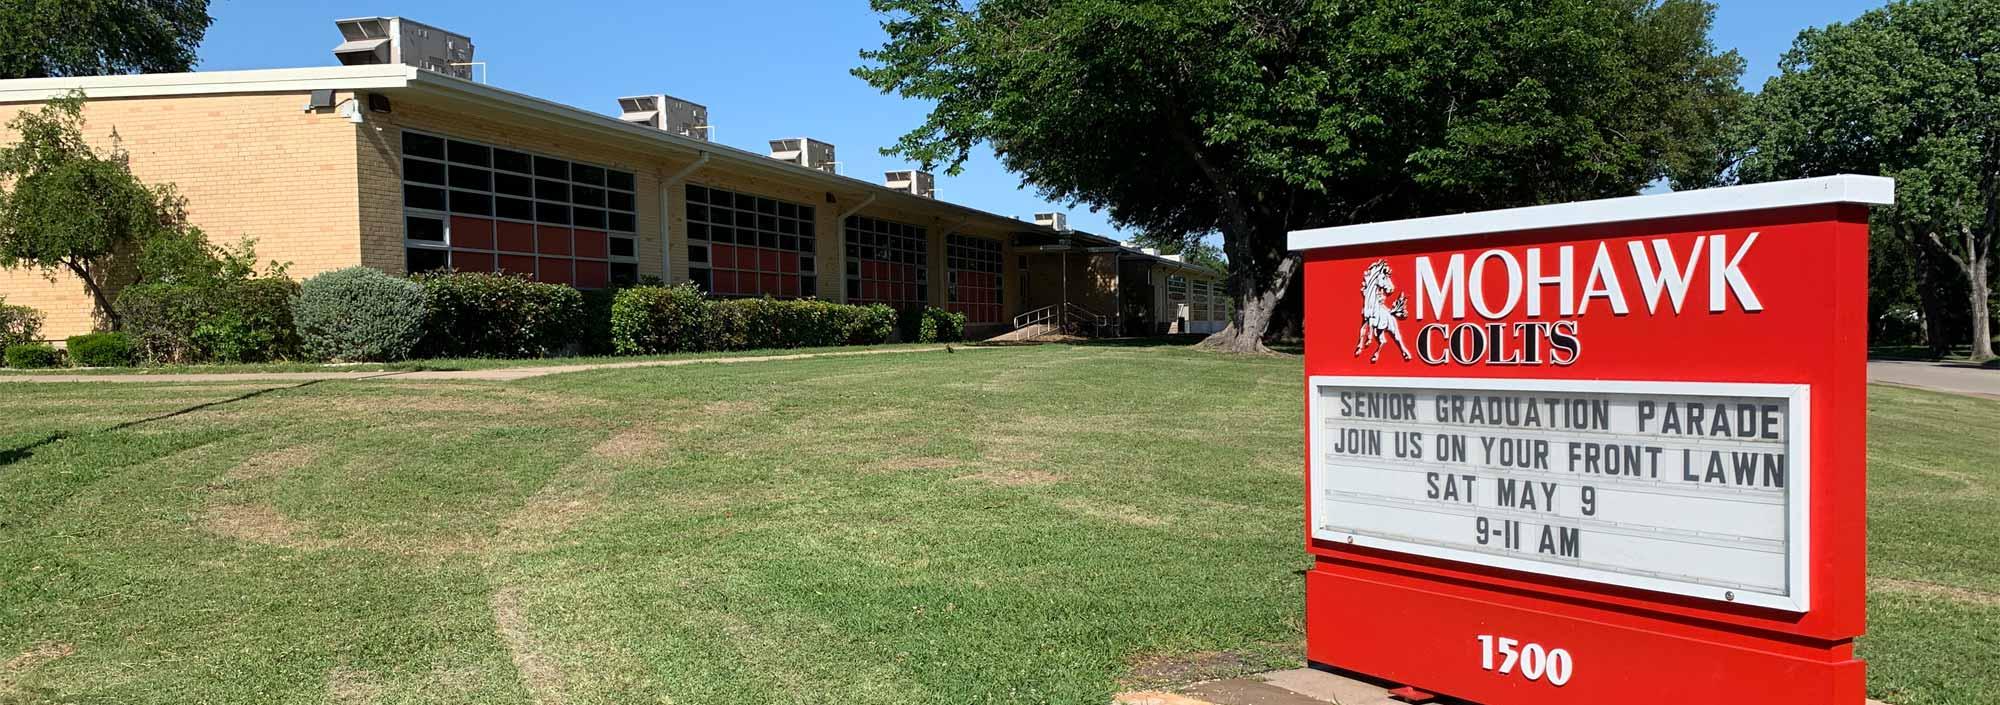 Mohawk Elementary sign